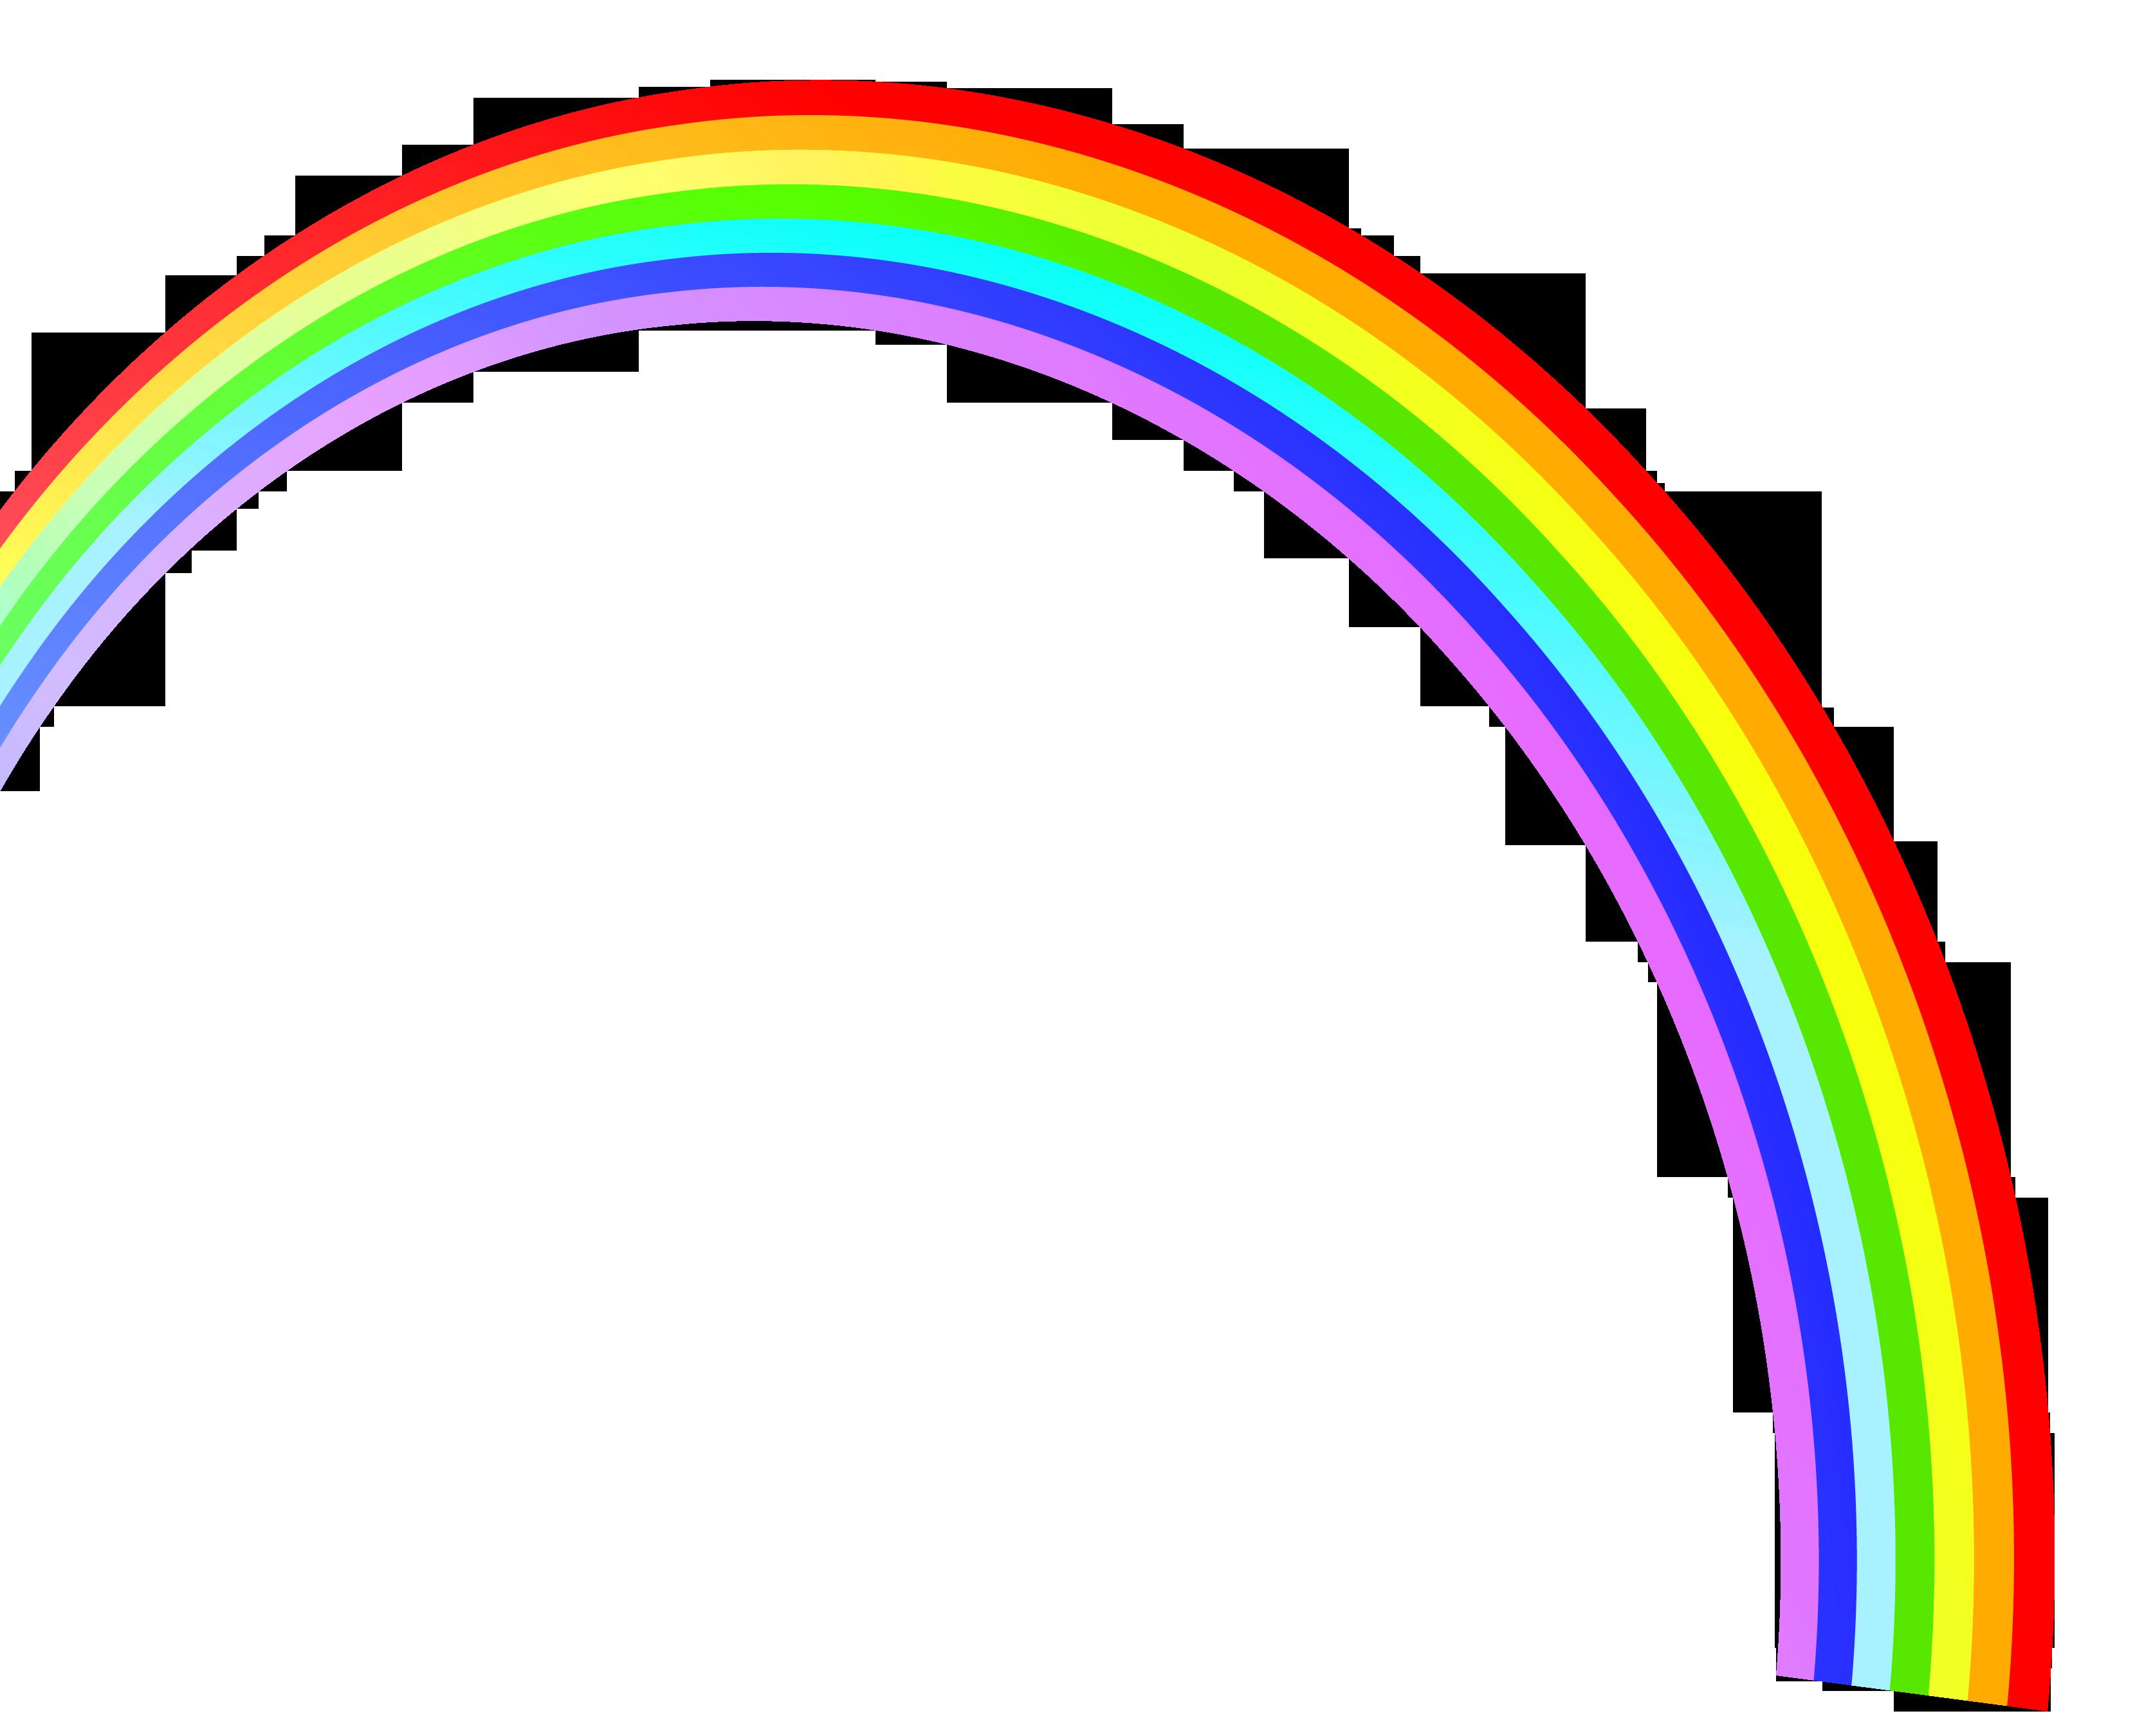 Sunglasses rainbow. Clipart transparent free for